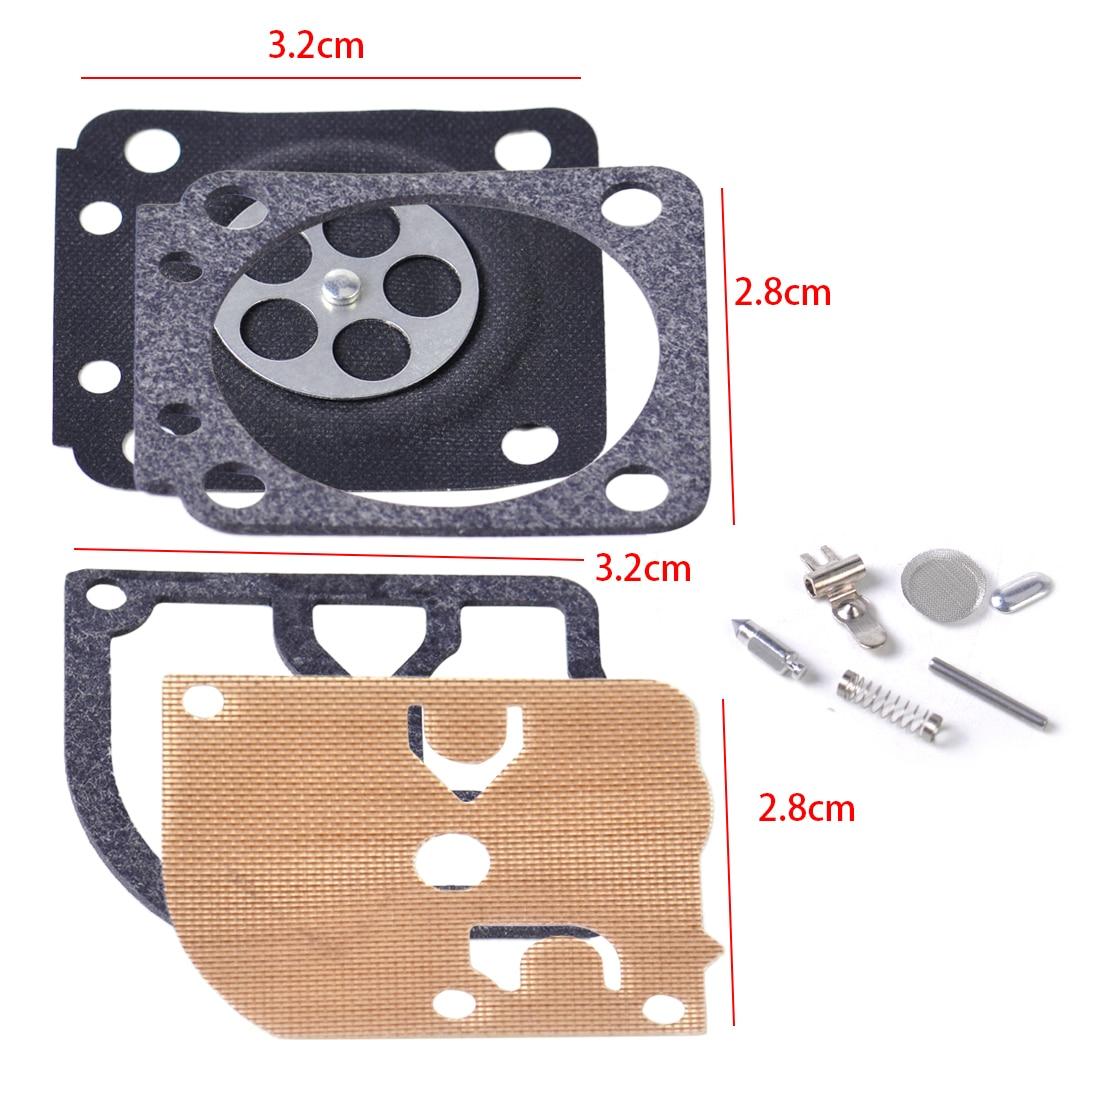 LETAOSK High Quality Carburetor Repair Rebuild Diaphragm Gasket Kit For STIHL 024 MS240 026 MS260 Chainsaw